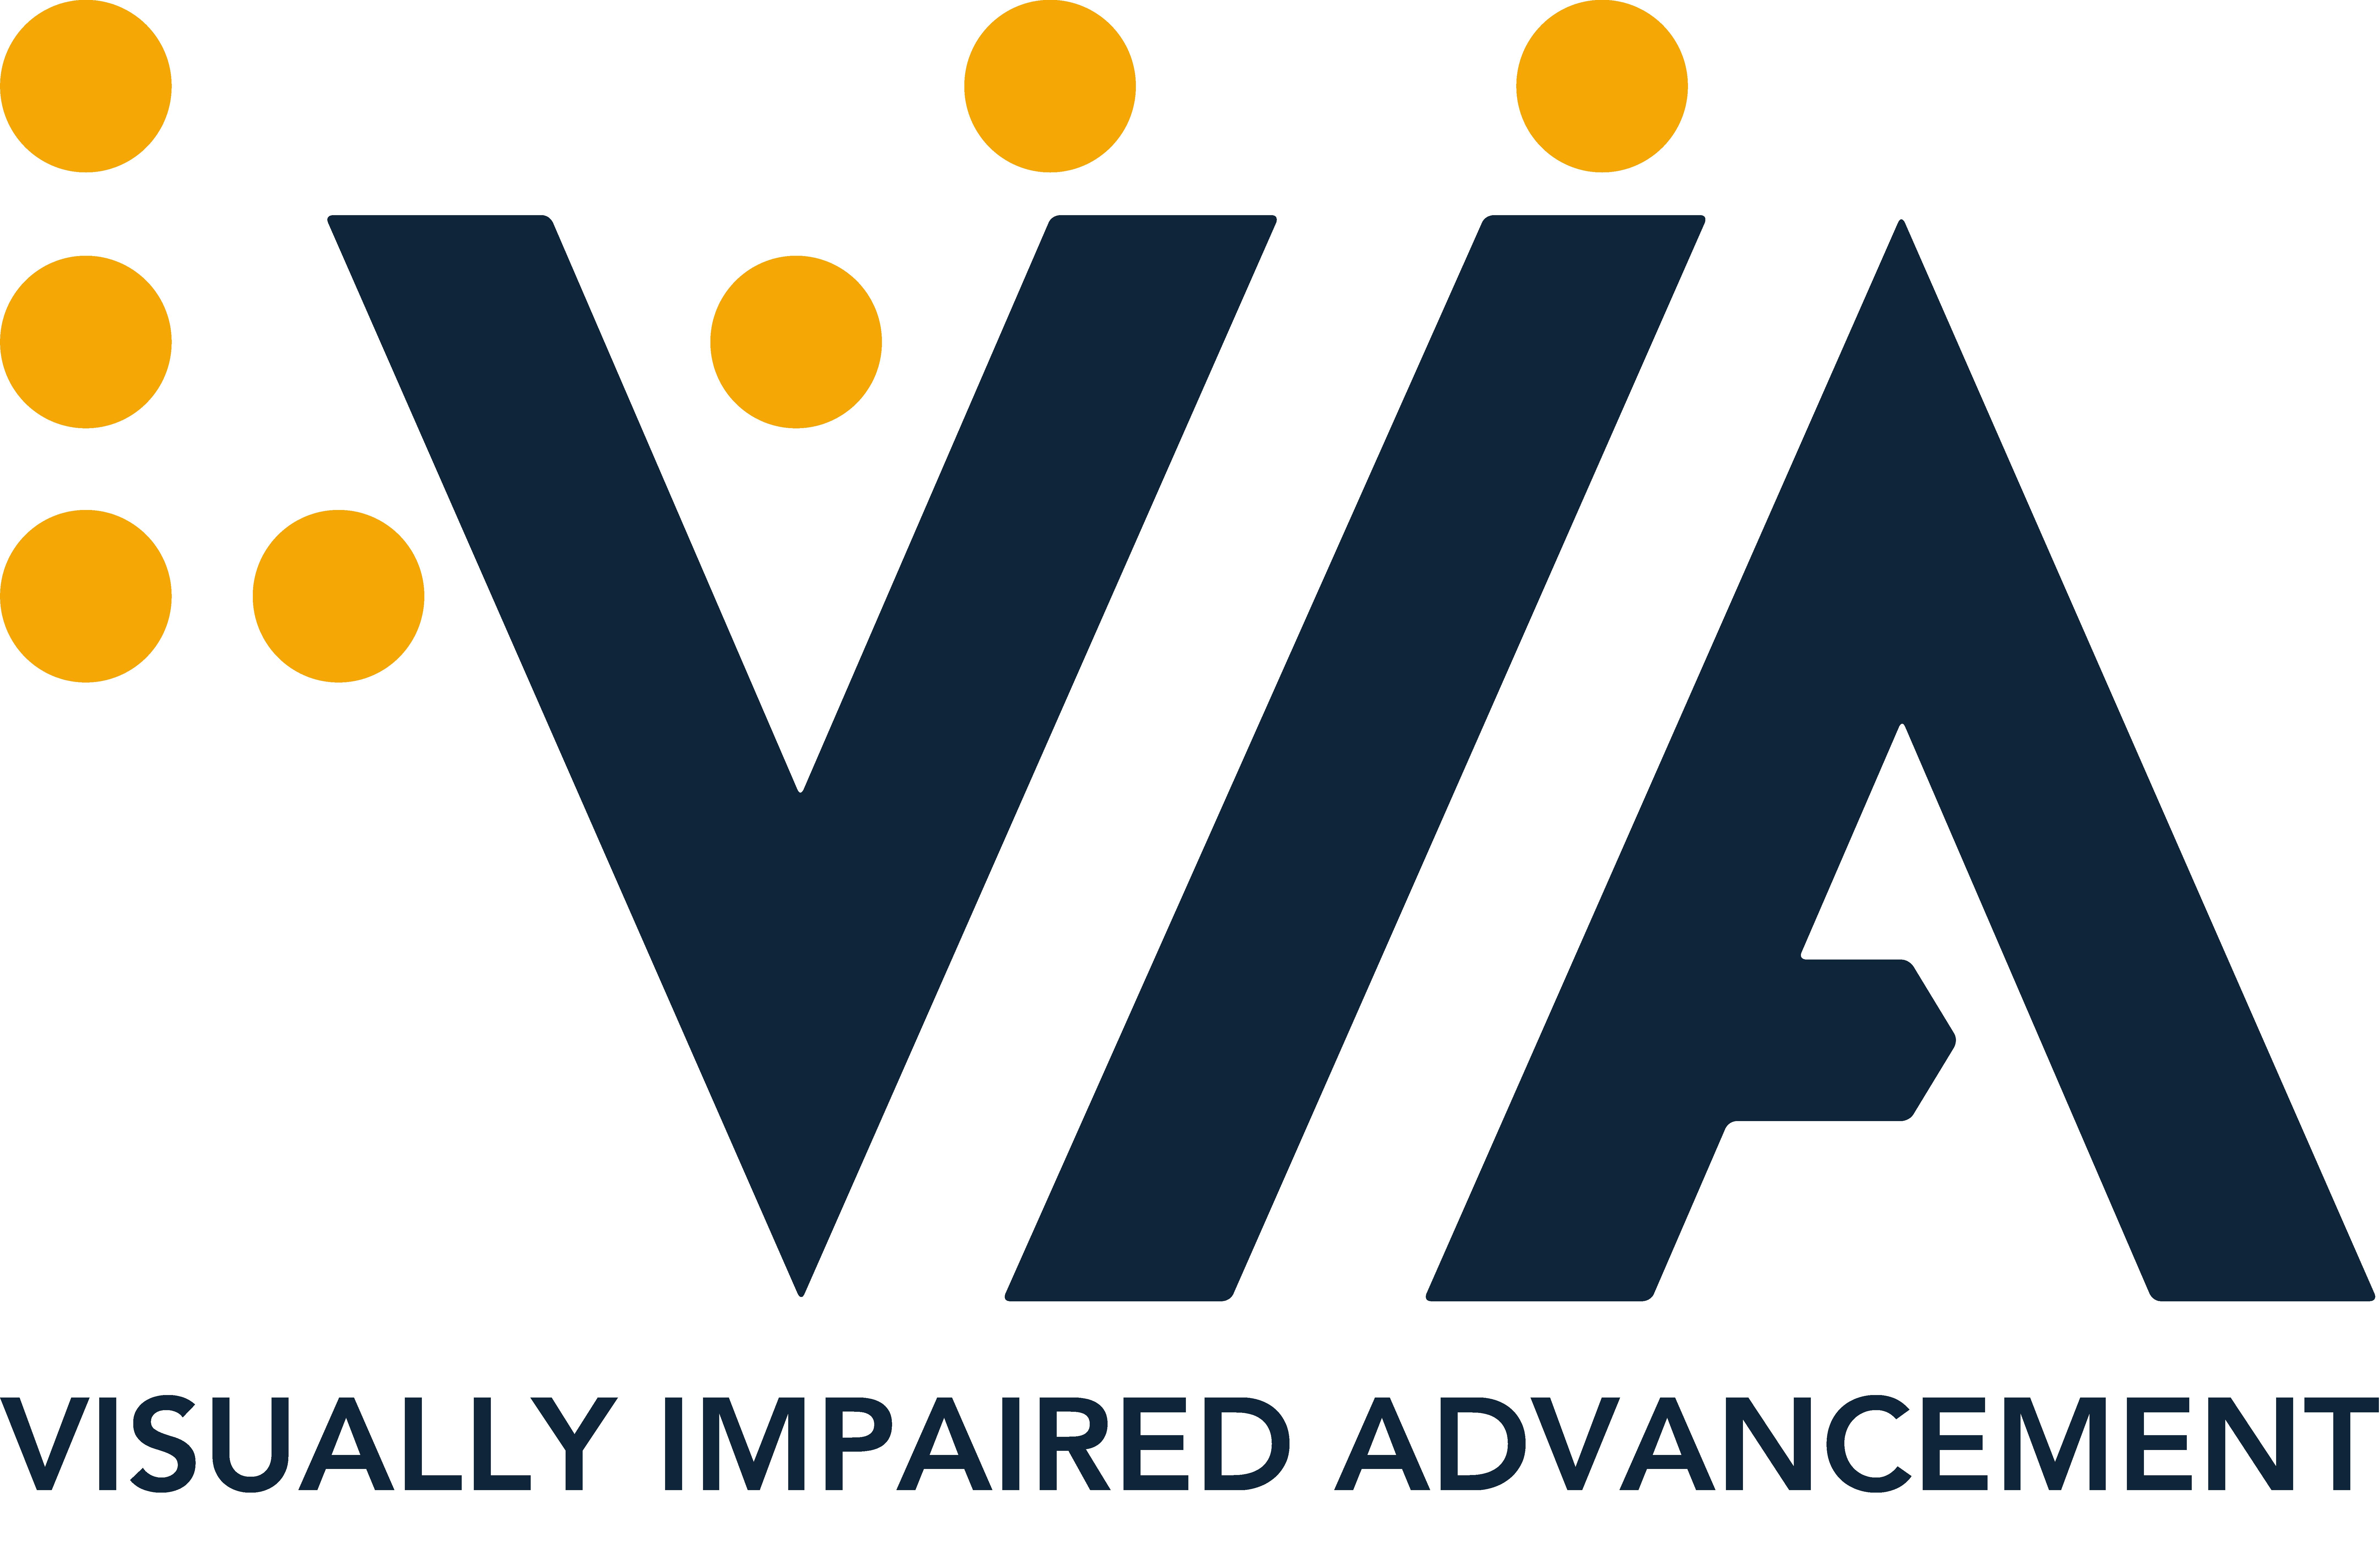 VIA: Visually Impaired Advancement logo